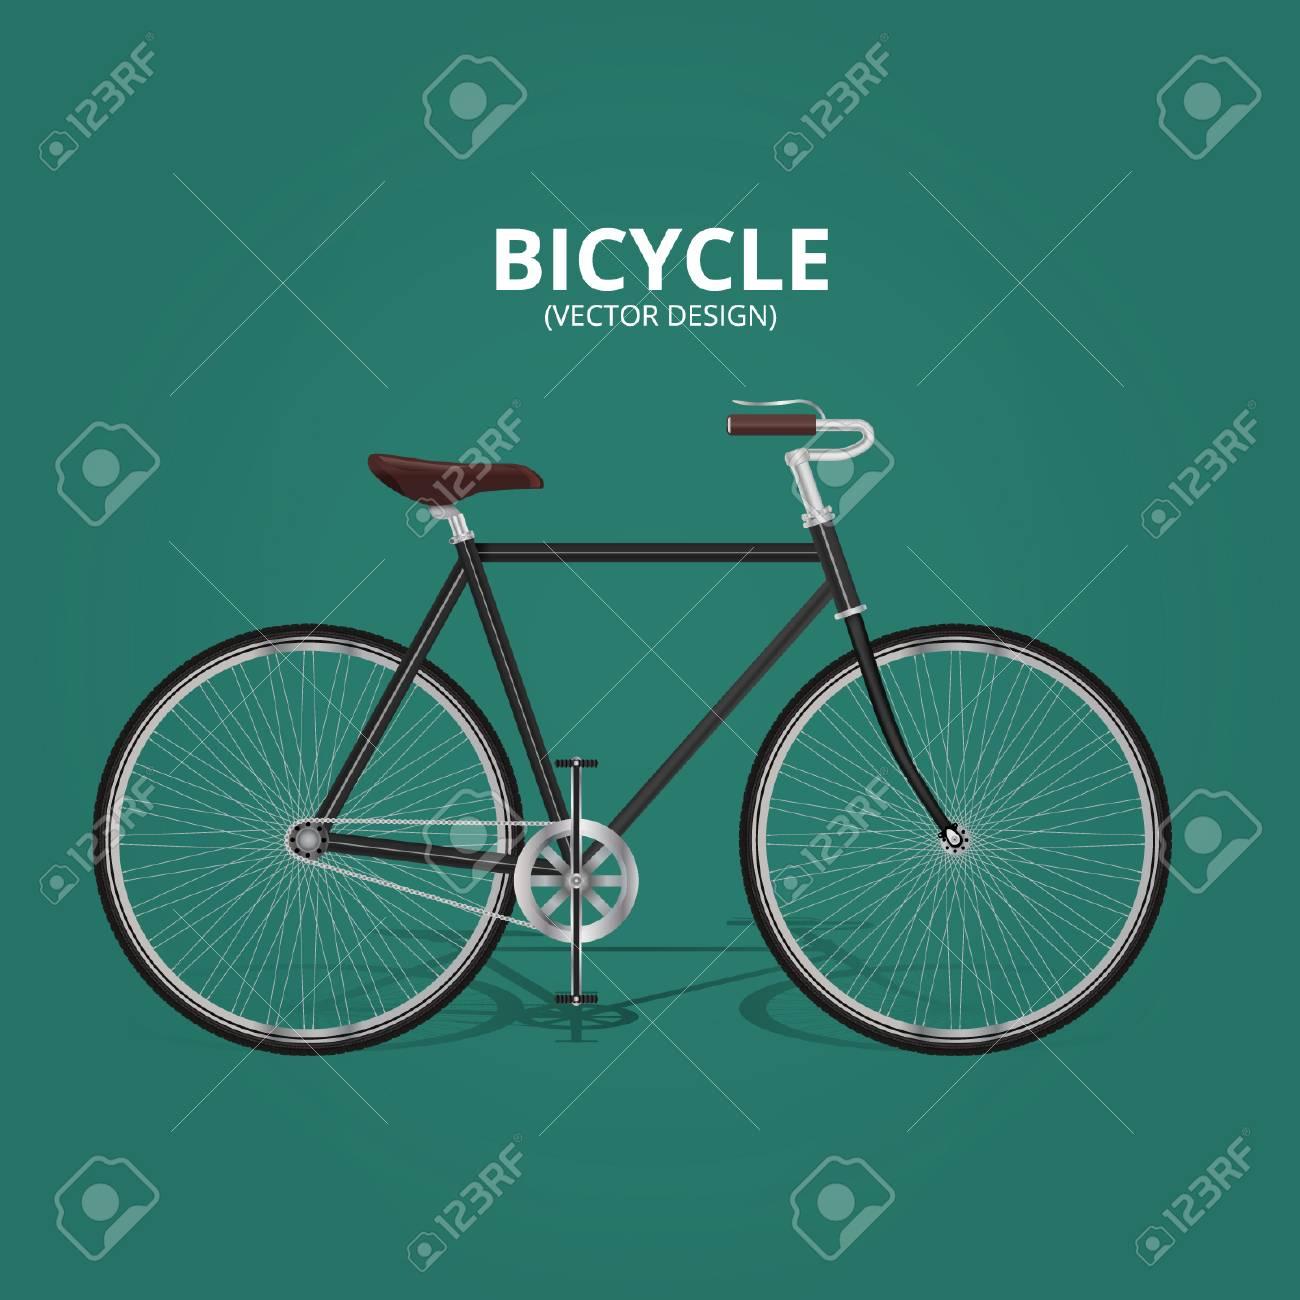 Bicycle - Realistic Vector Design - 110628694